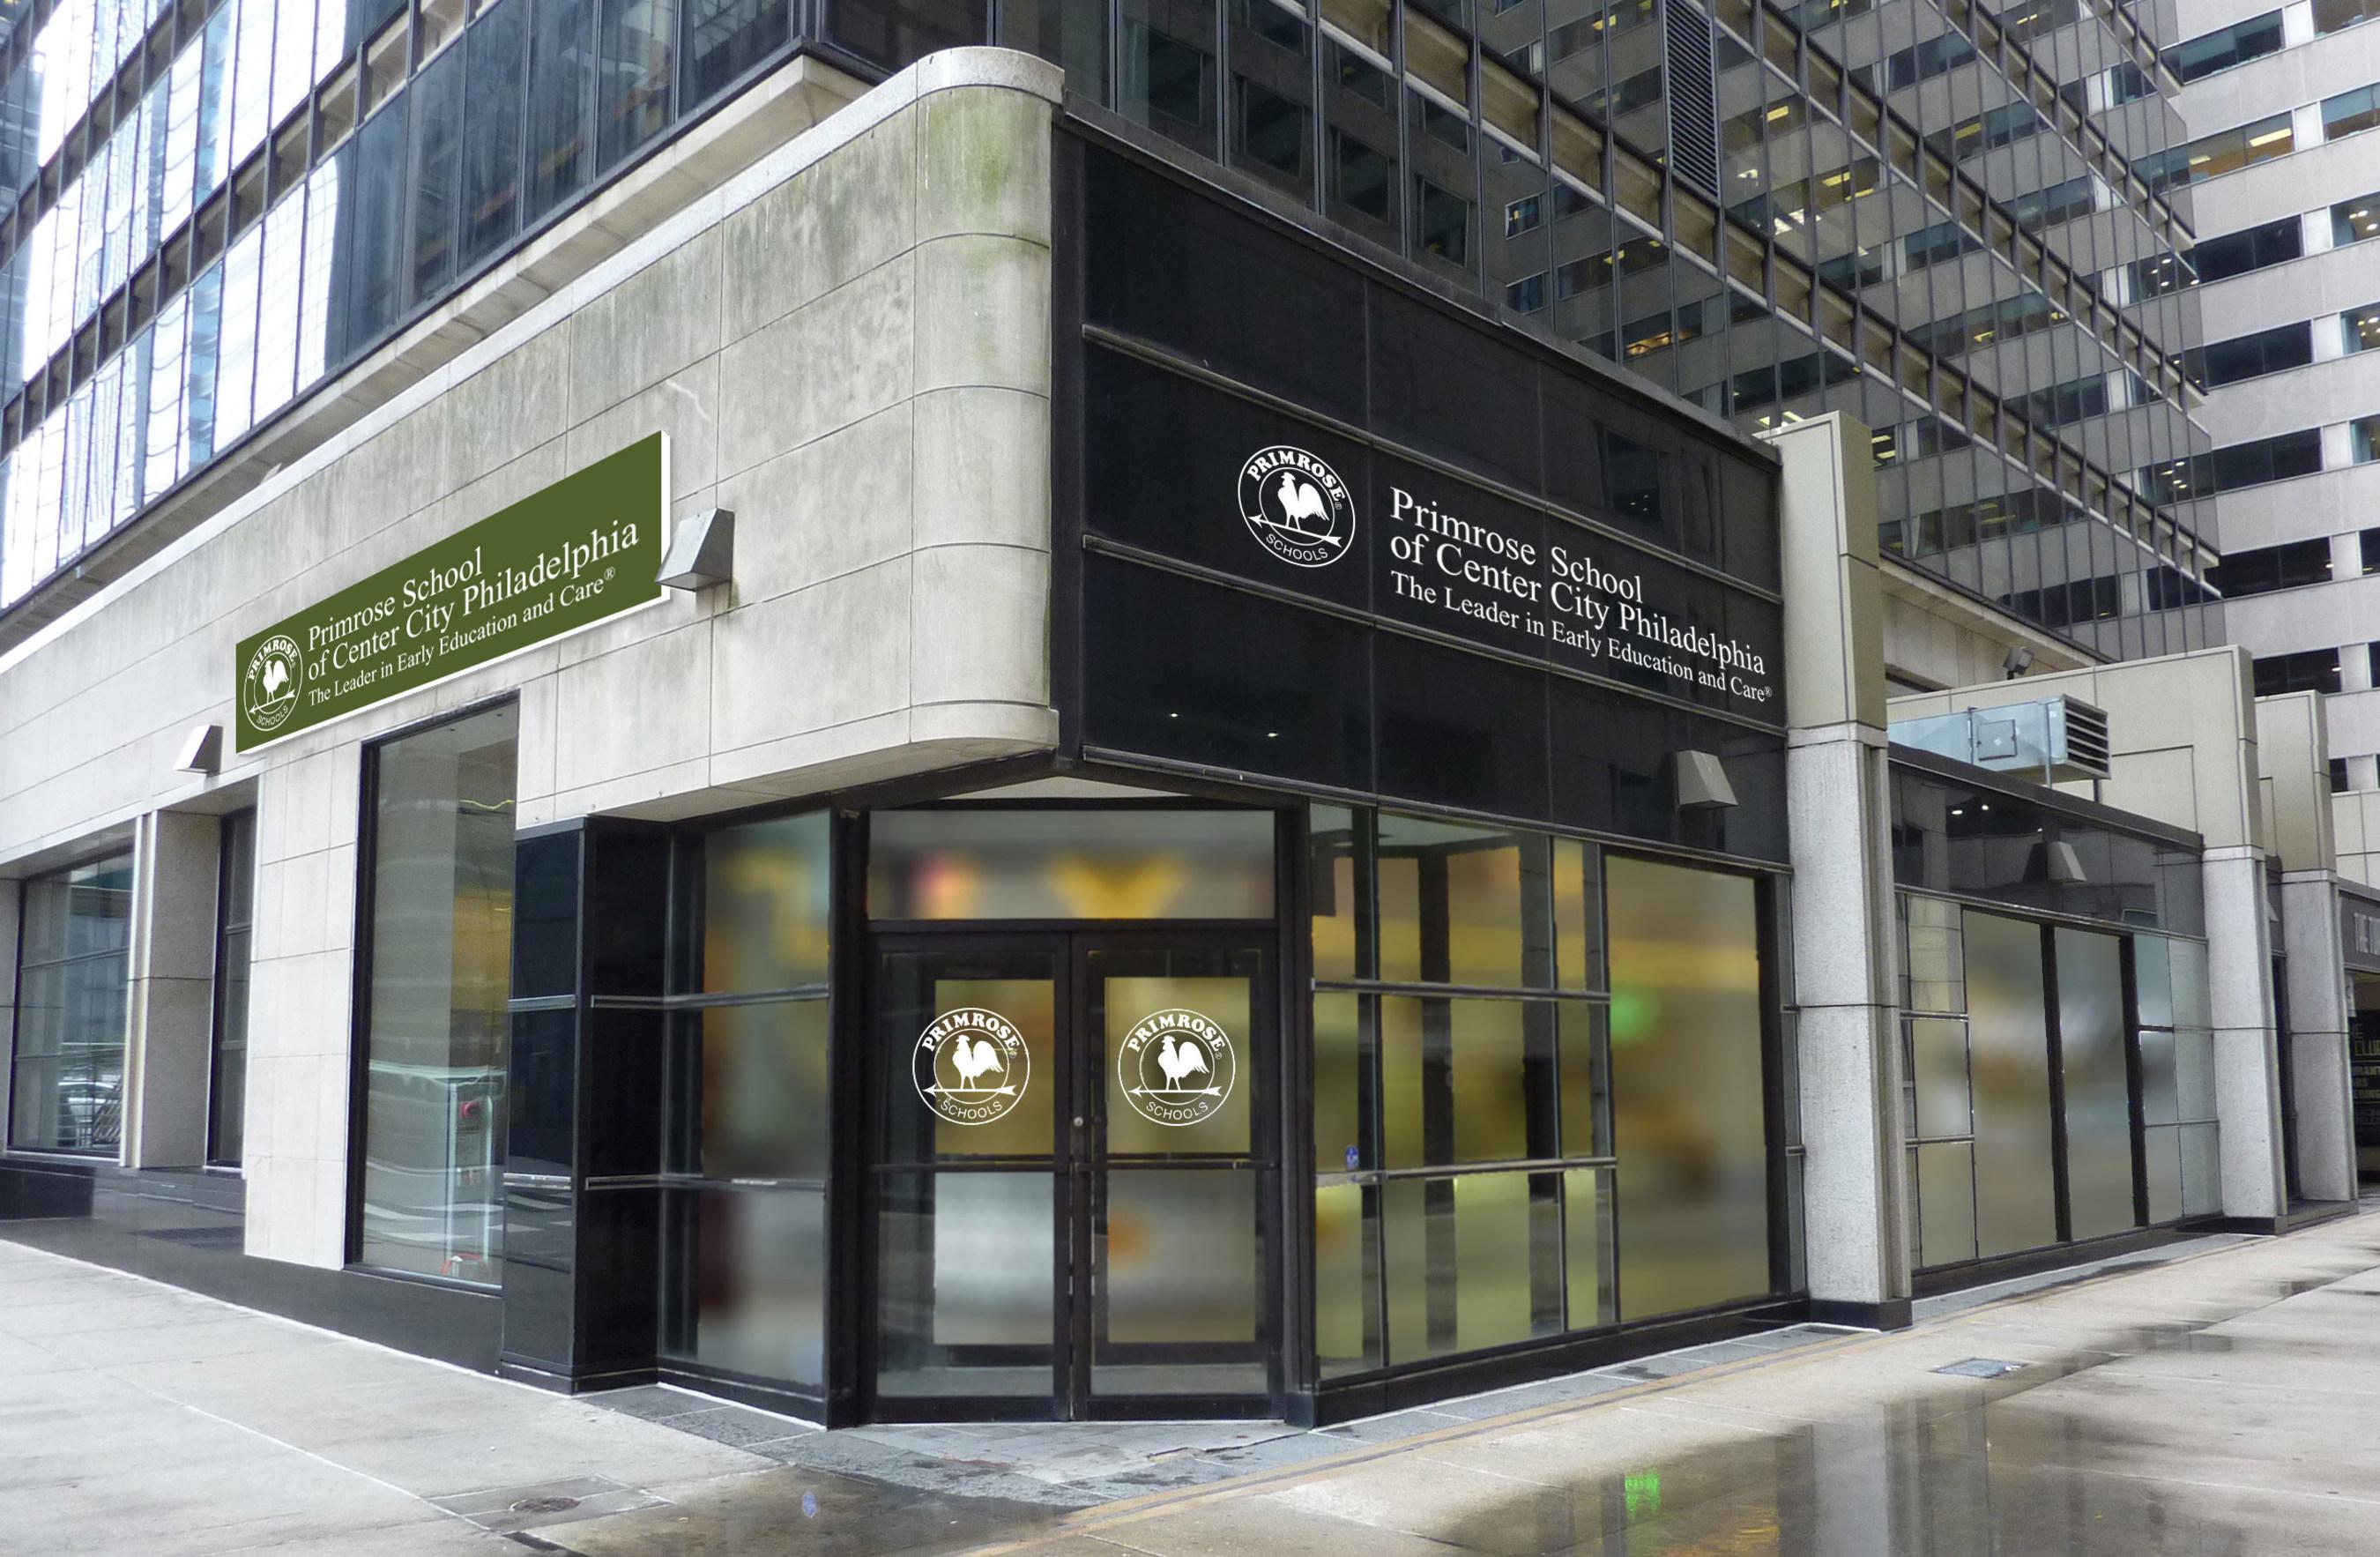 Composite image of the new Primrose School of Center City Philadelphia